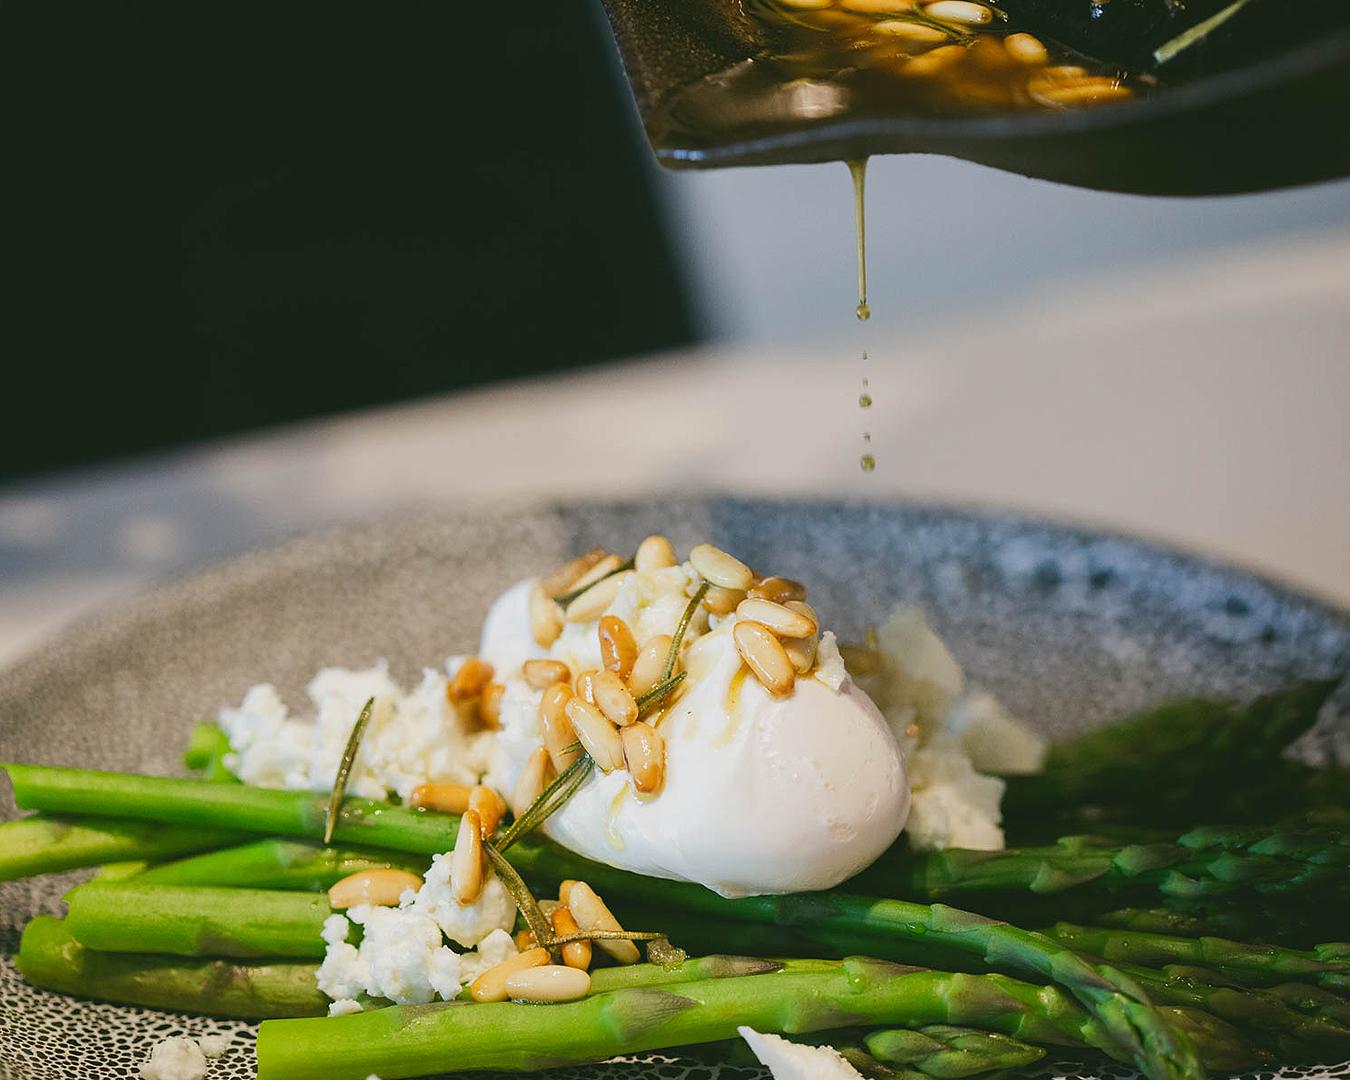 An egg, asparagus and pine nut dish at Homeland.